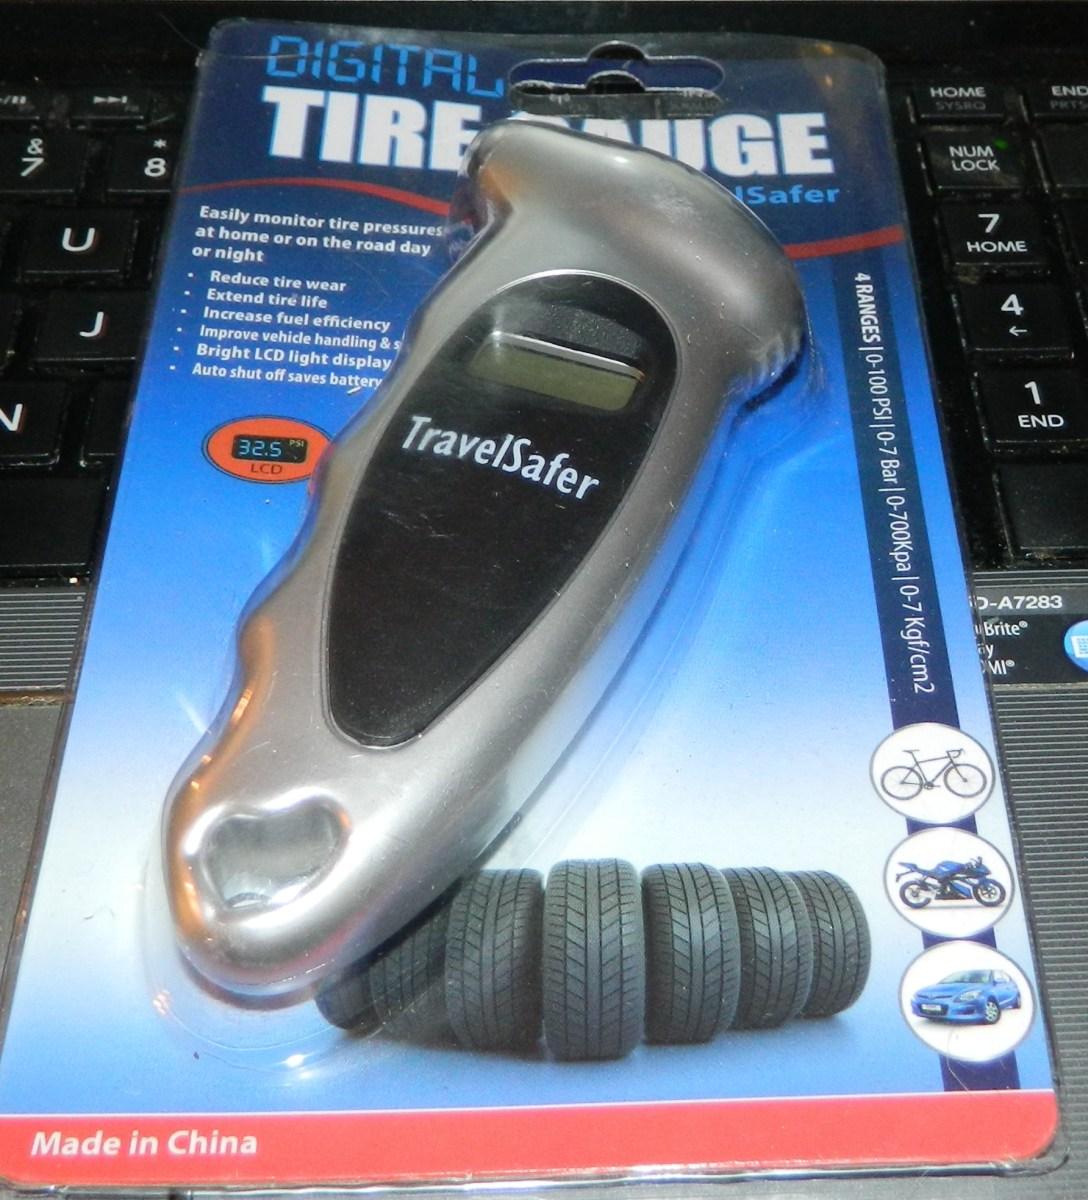 Home Digital Tire Gauge